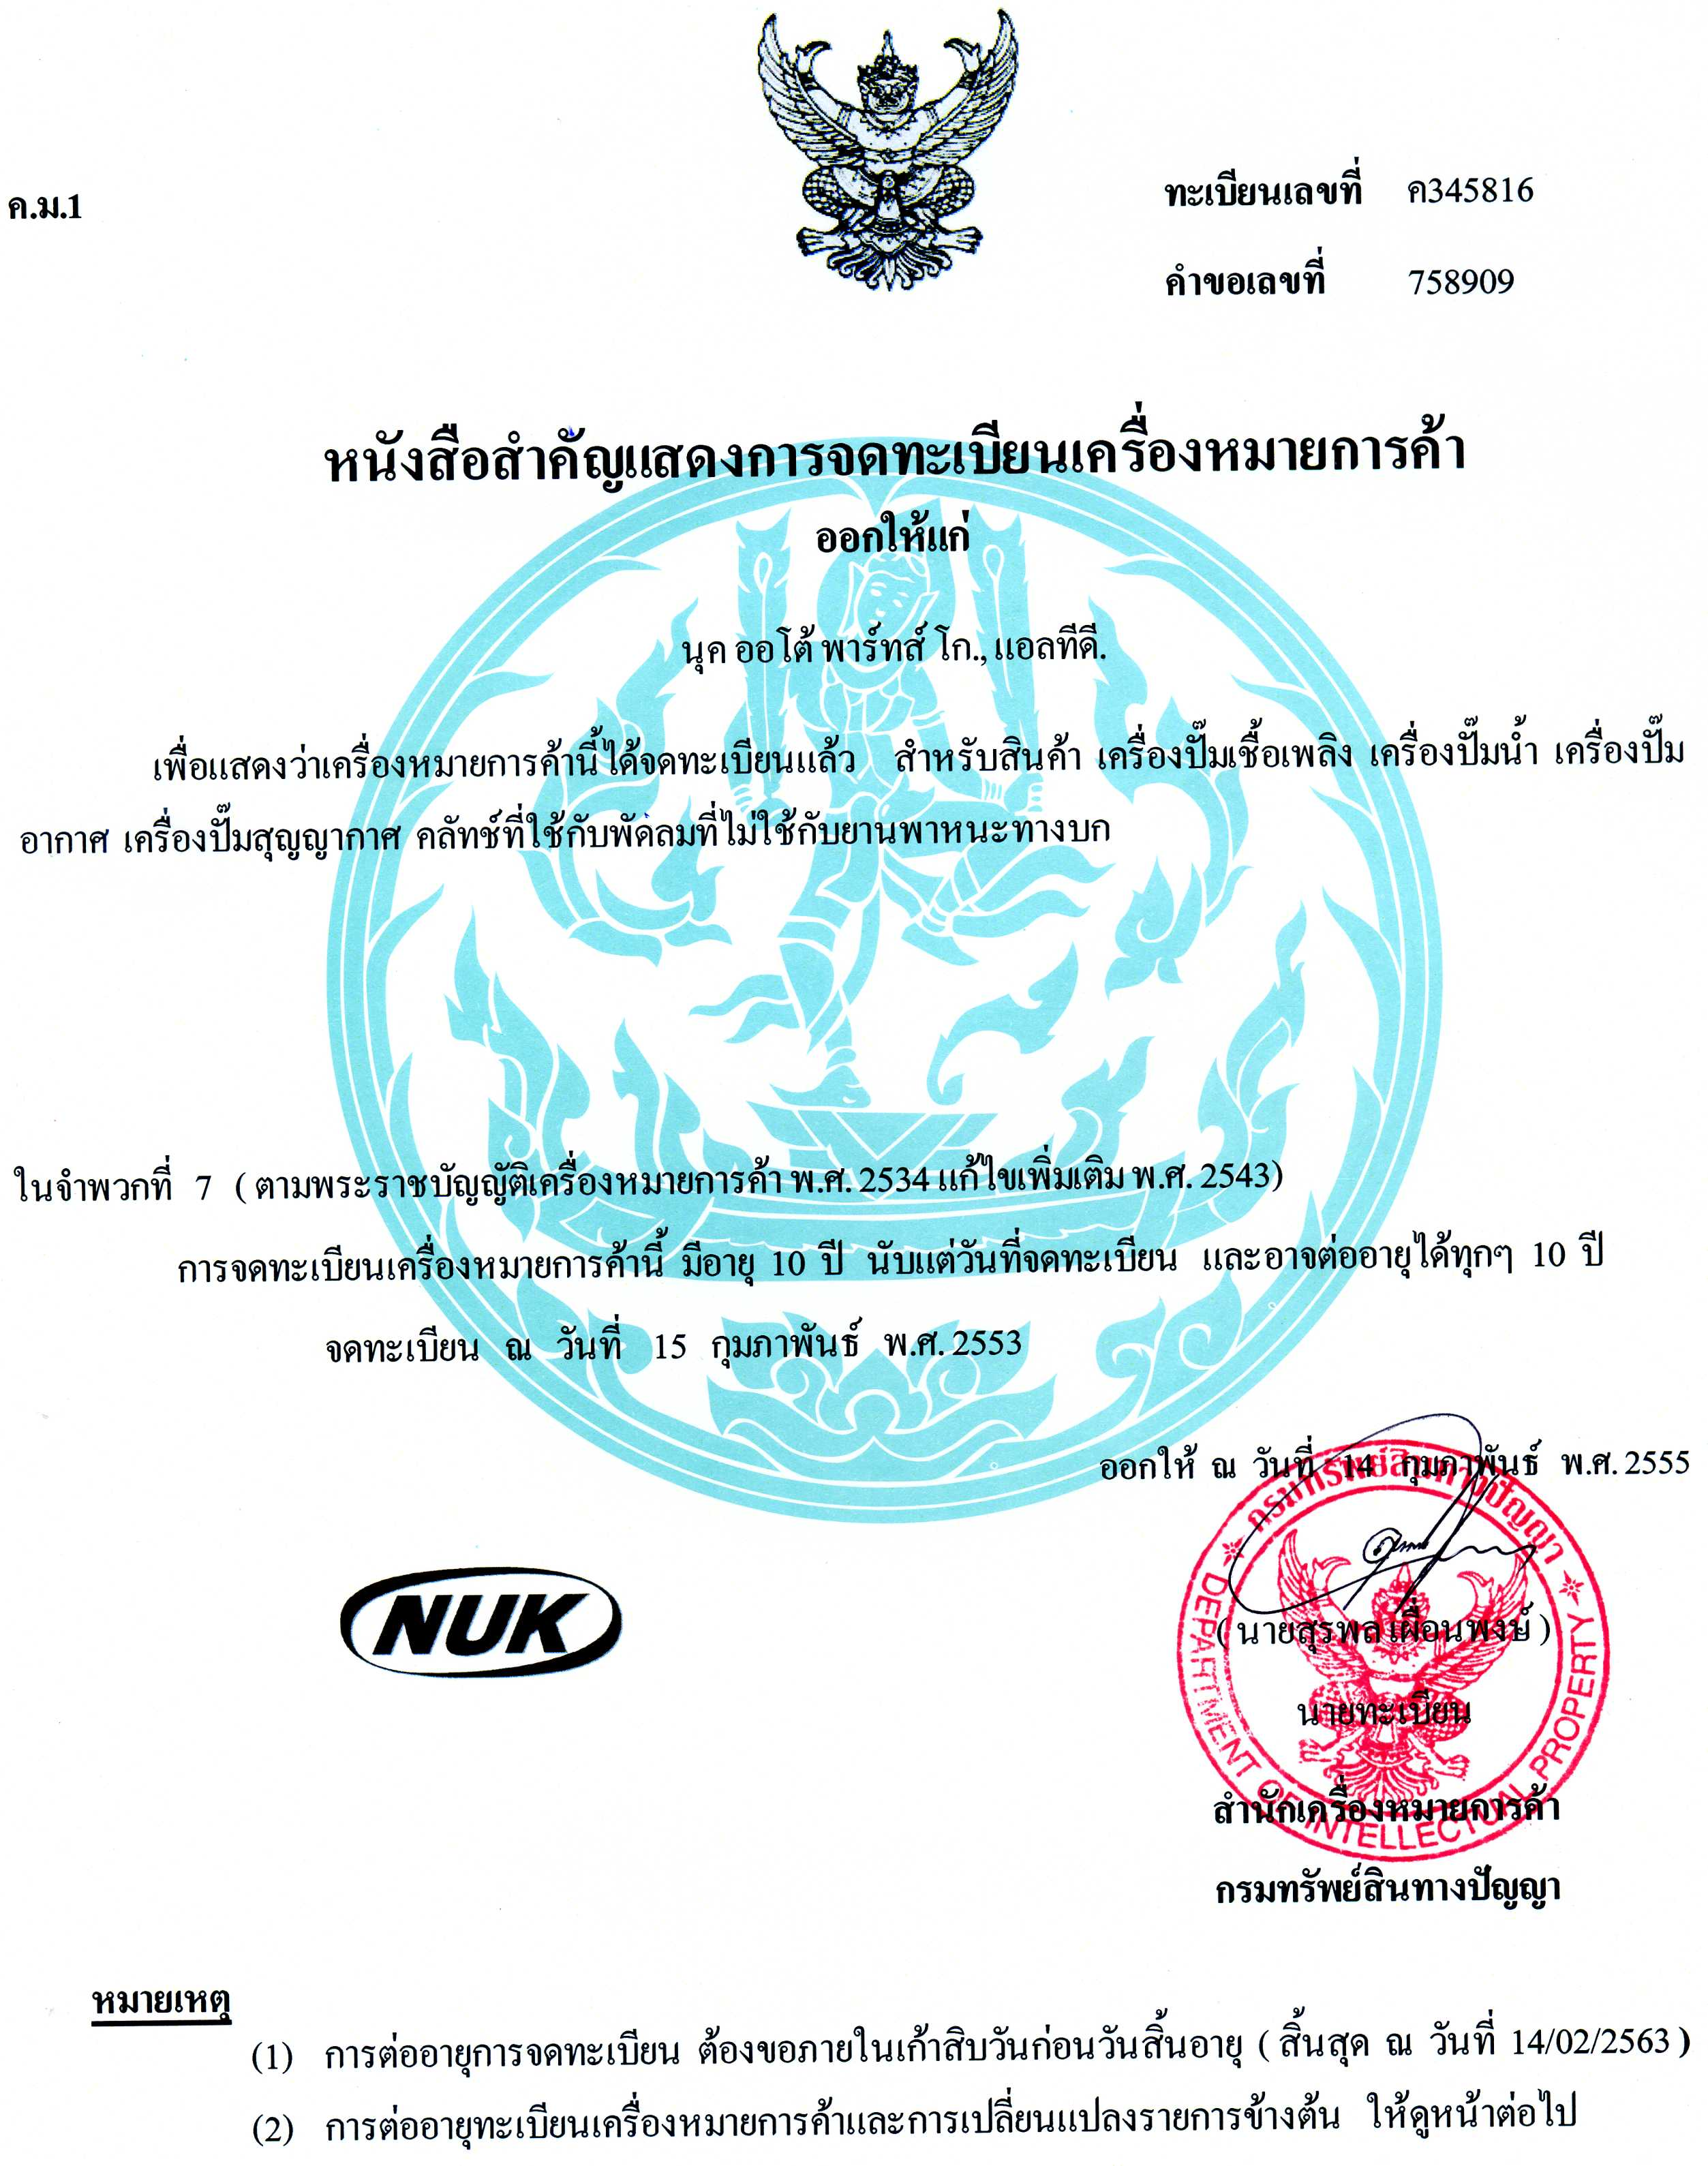 NUK THAILAND